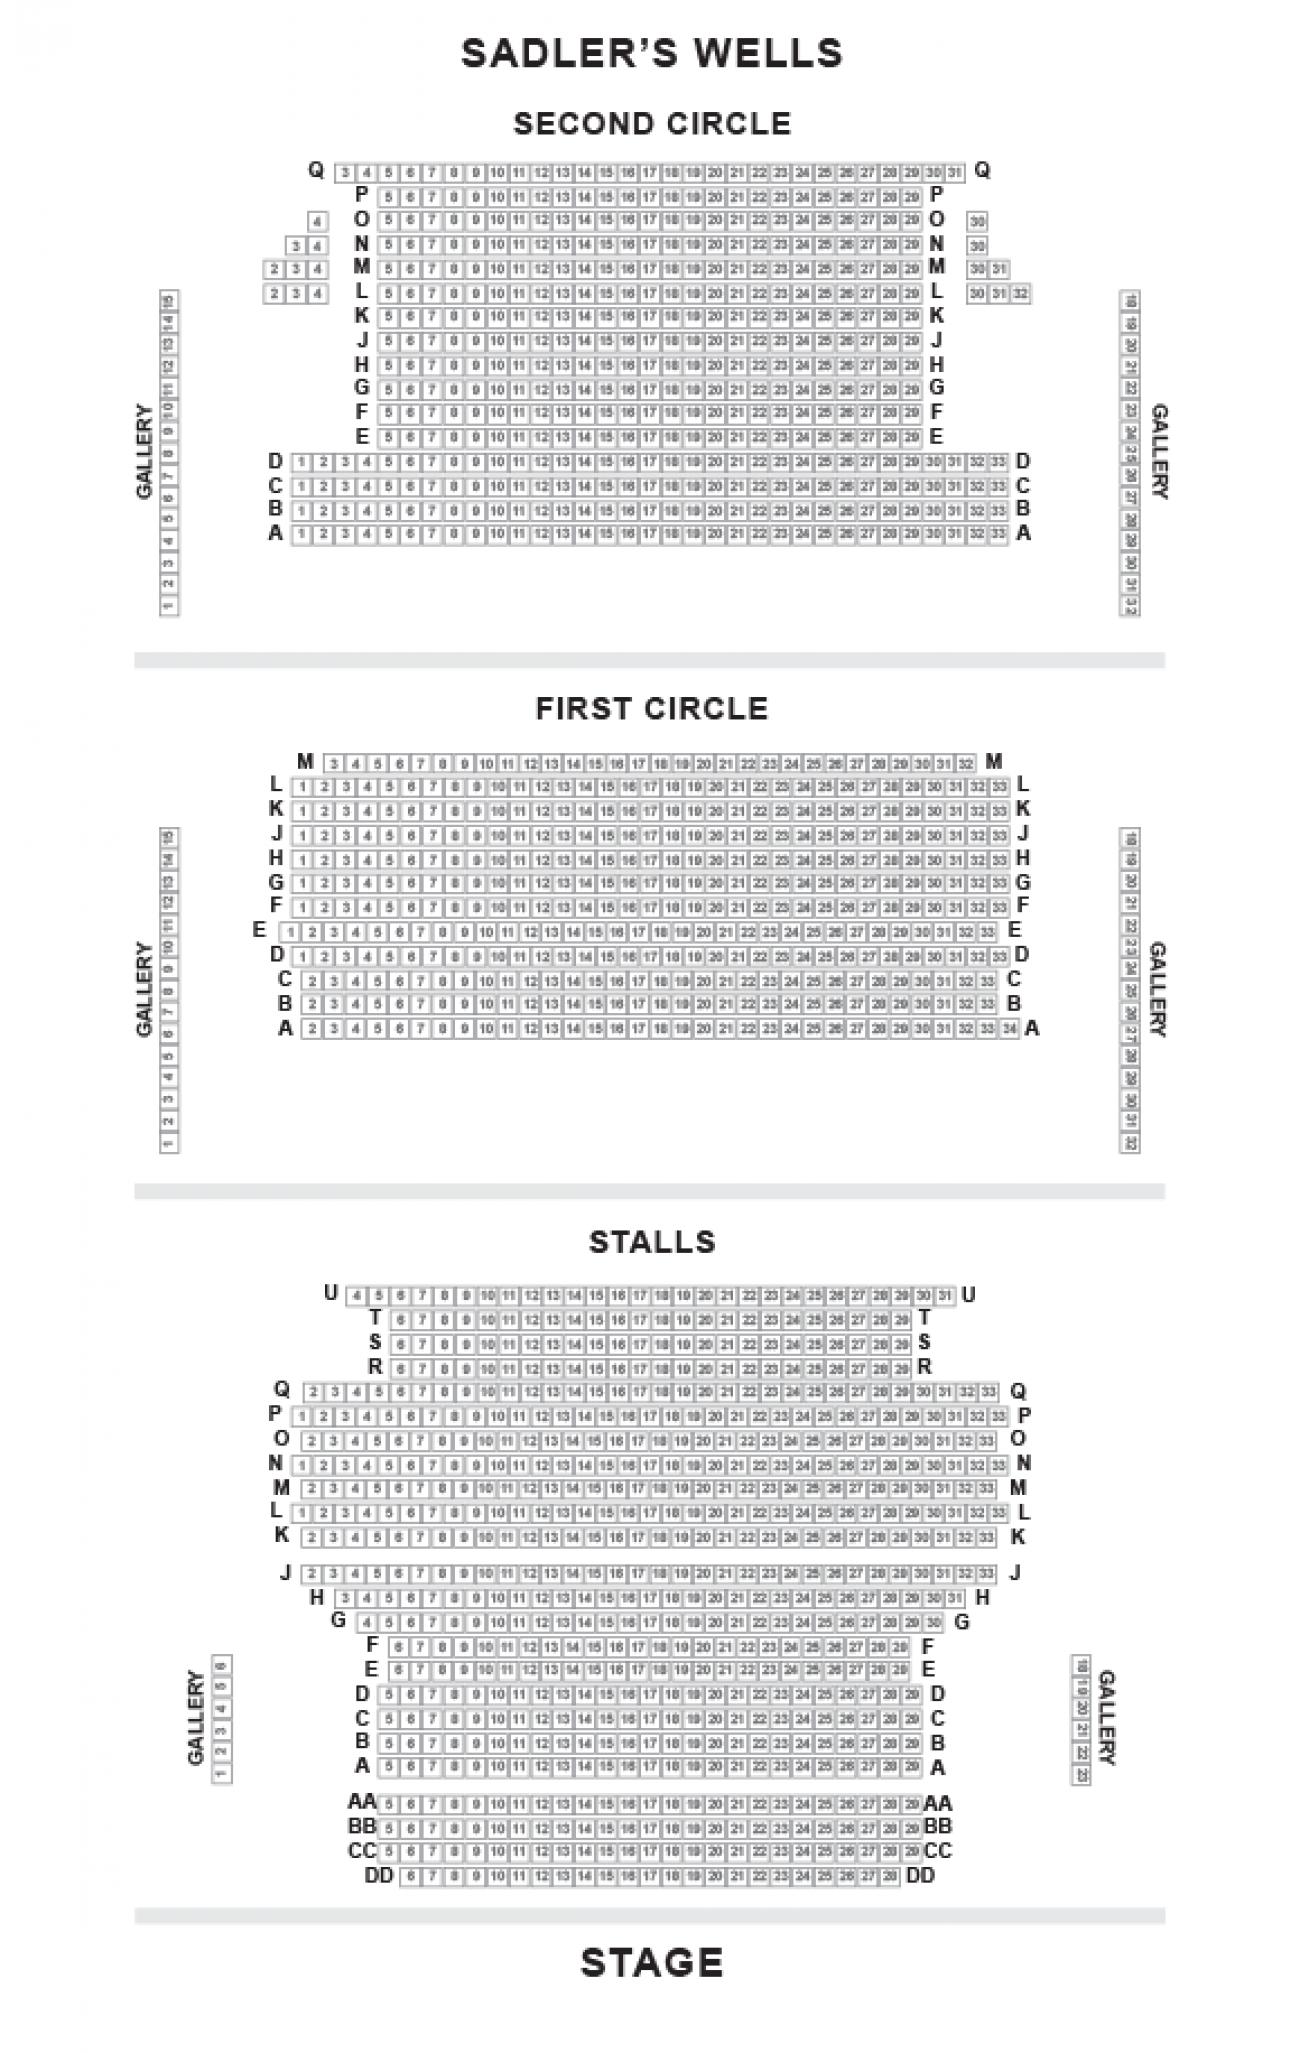 Sadlers Wells Seating plan